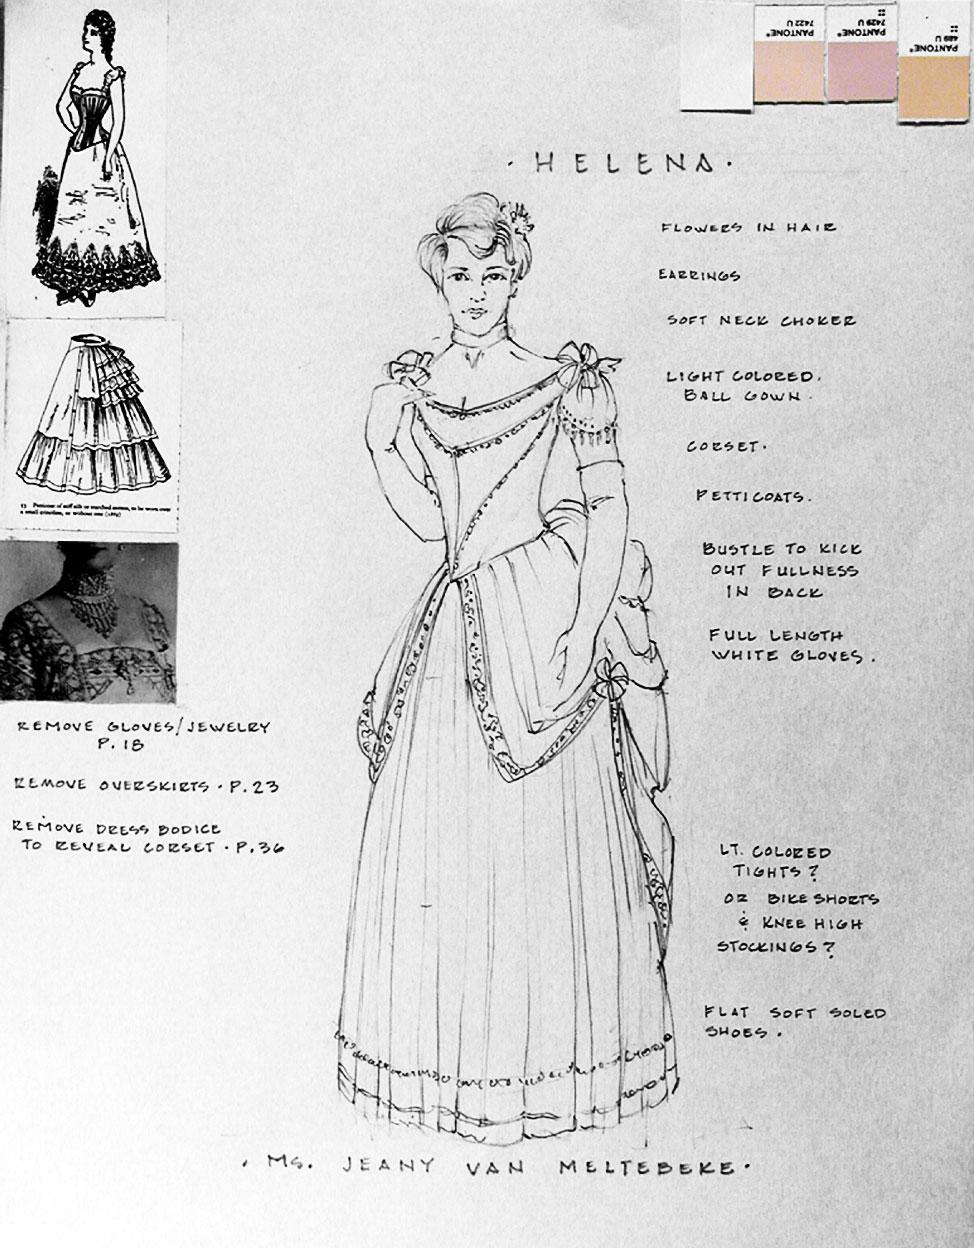 midsummer-nights-dream-helena-costume-design-michael-ganio.jpg